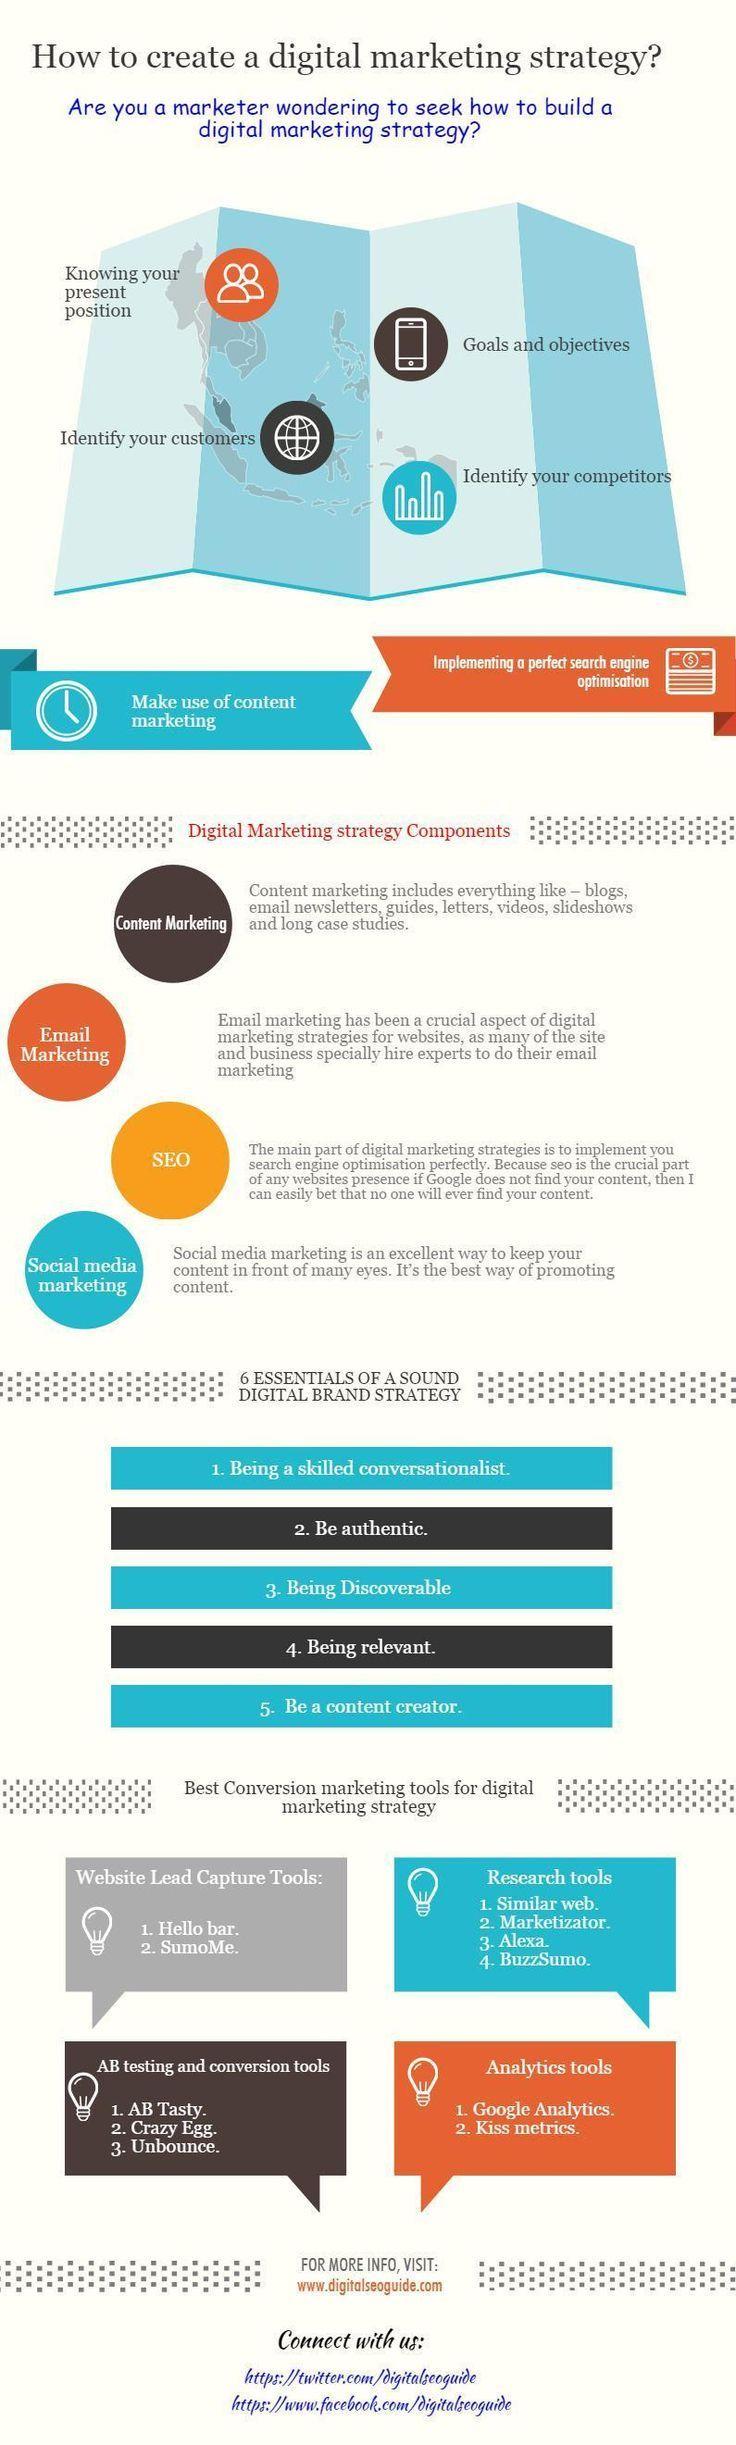 41 best CMS - Content Management System images on Pinterest ...